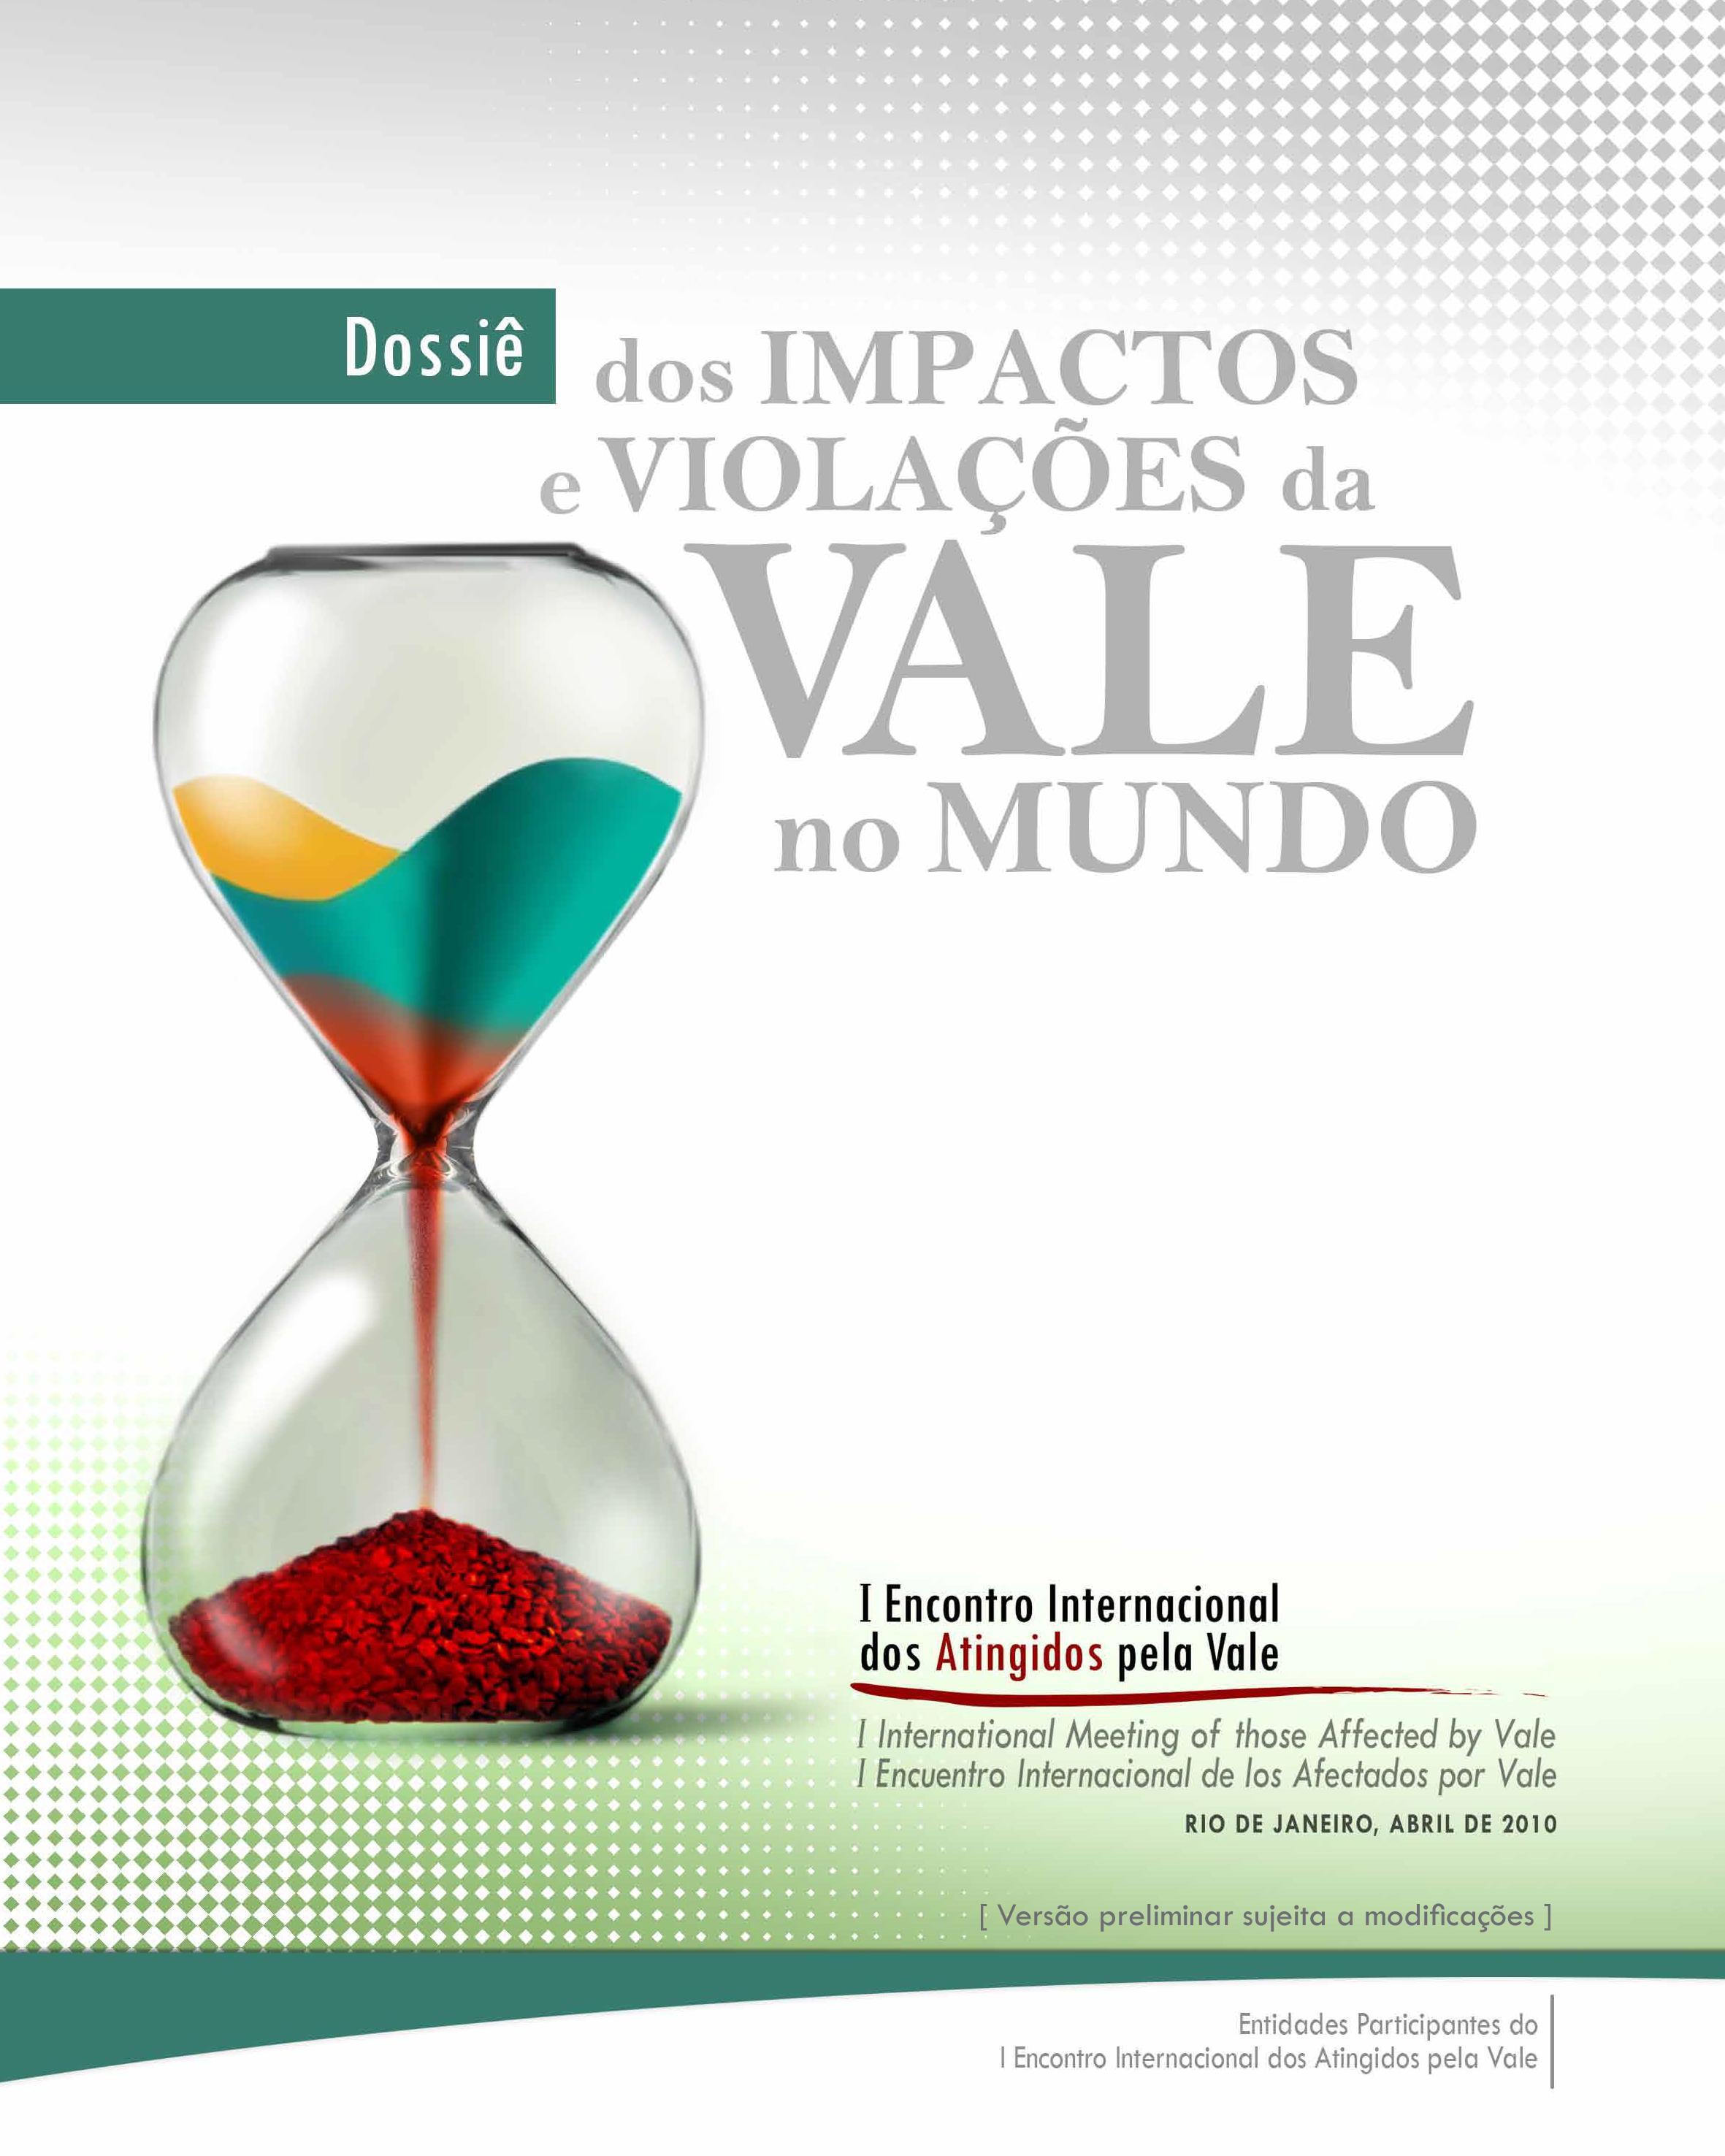 Cartilhas IMPACTOS VIOLACOES VALE 2010 leitura 1